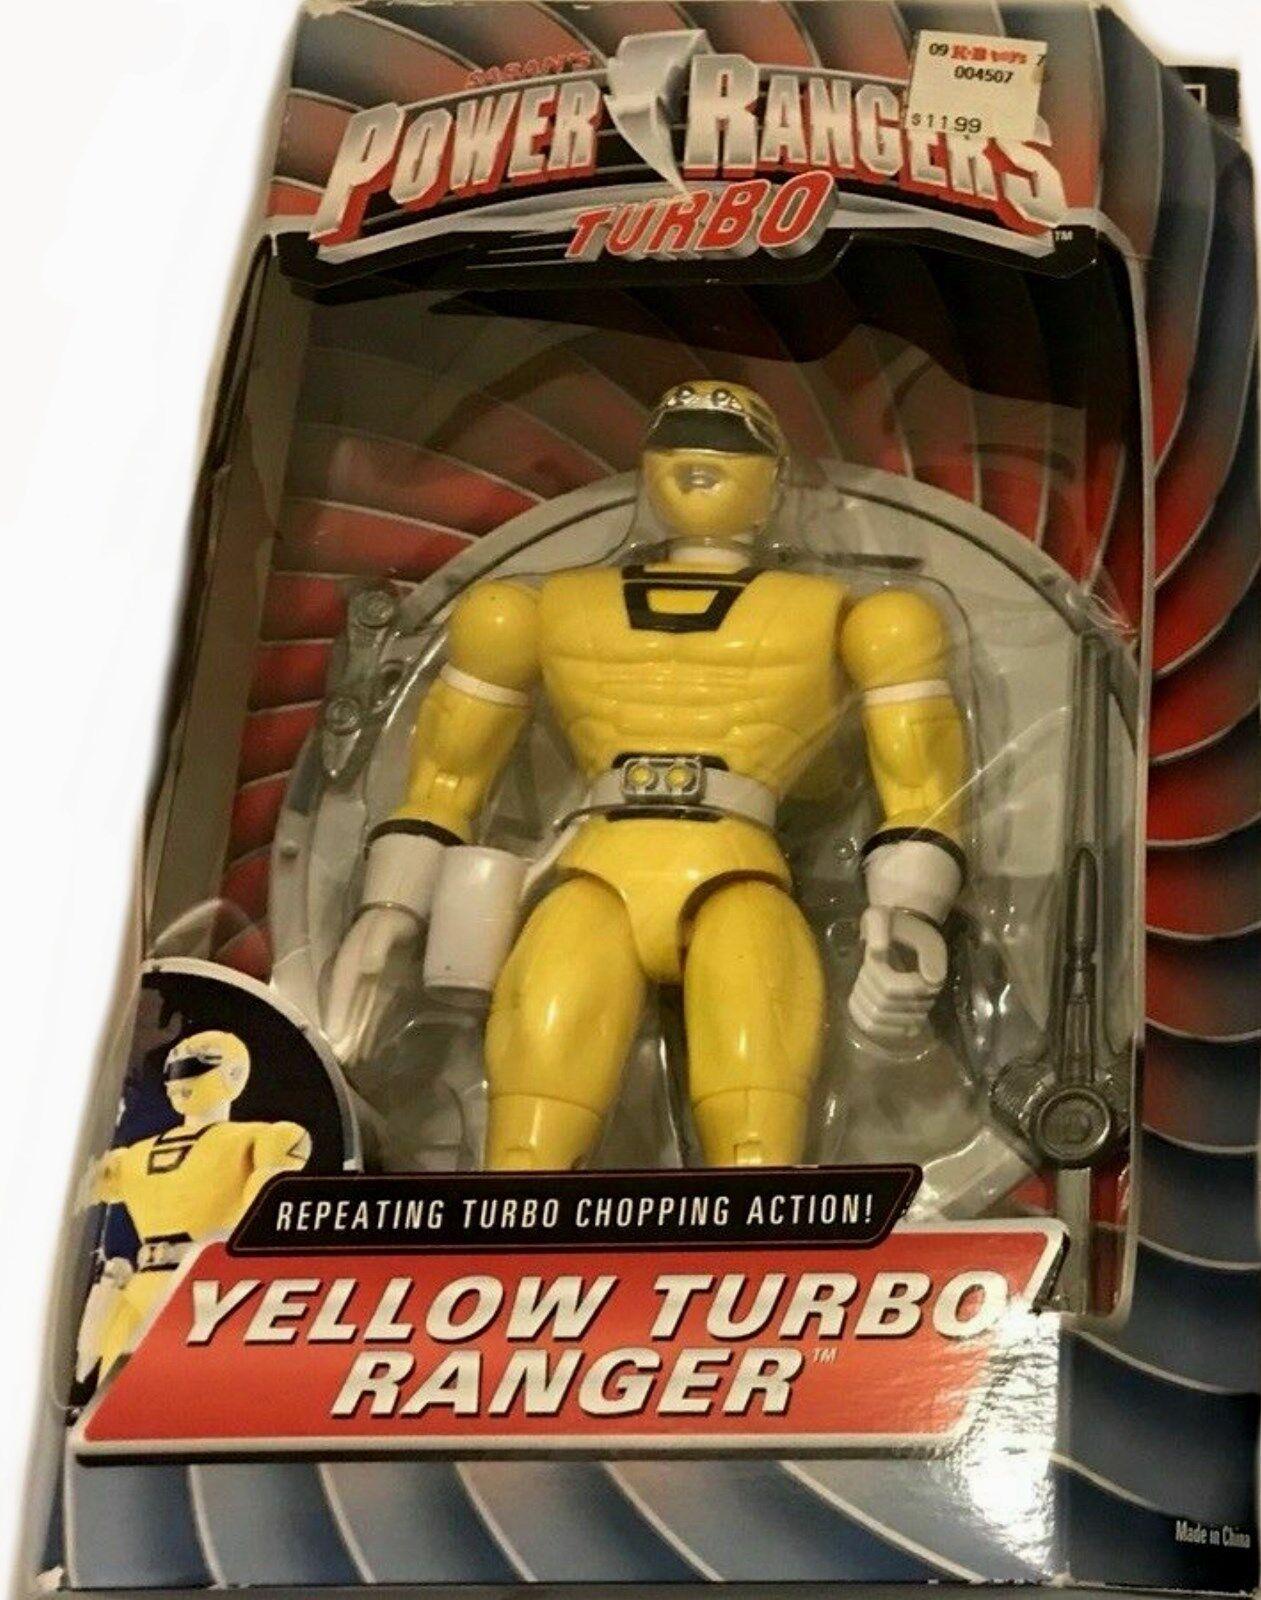 Power rangers turbo - 8  gelbe turbo ranger neue fabrik versiegelt, 1997